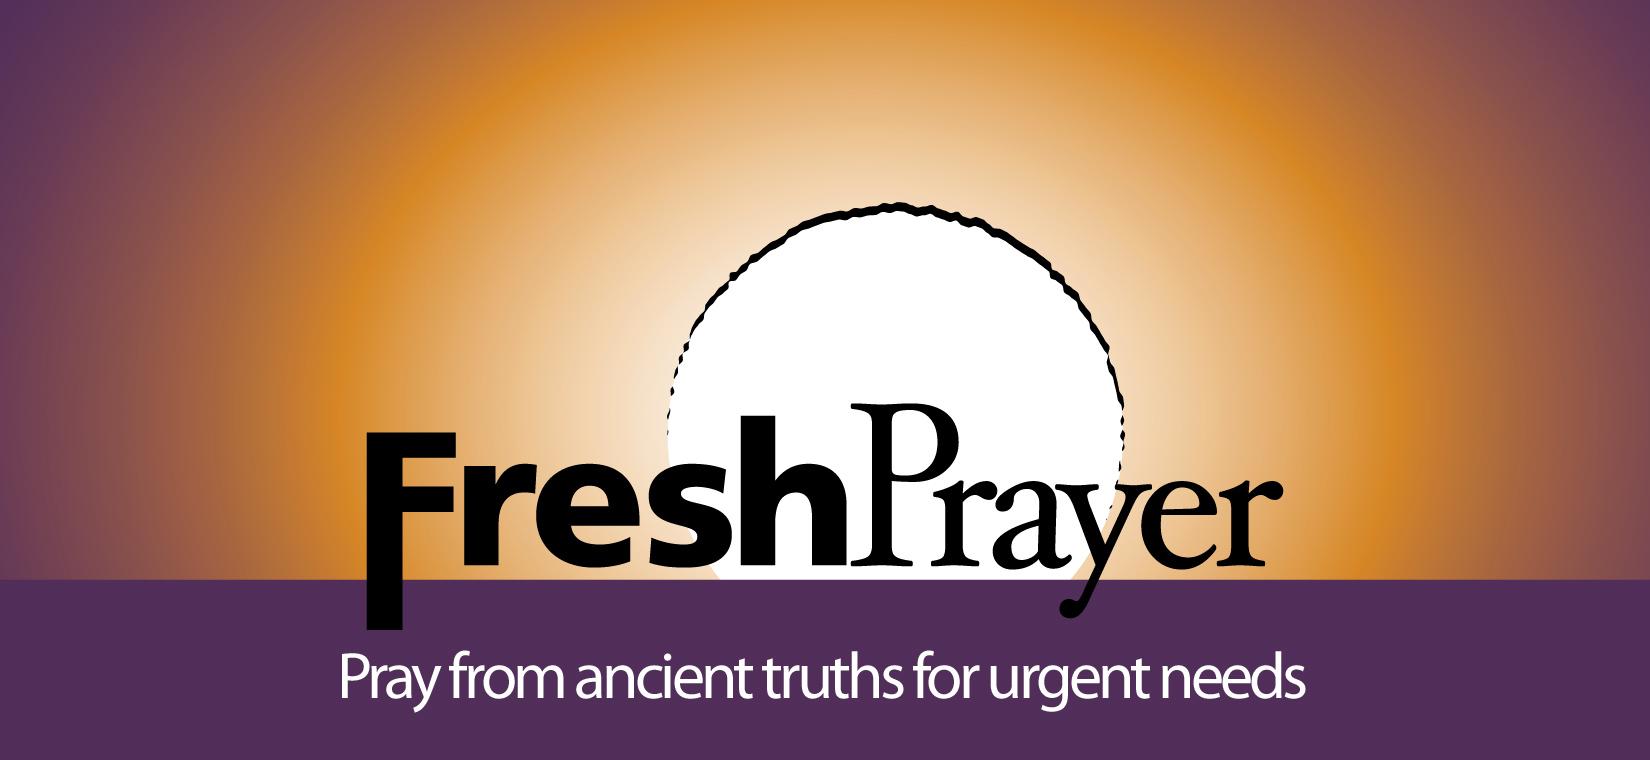 FreshPrayer_Banner